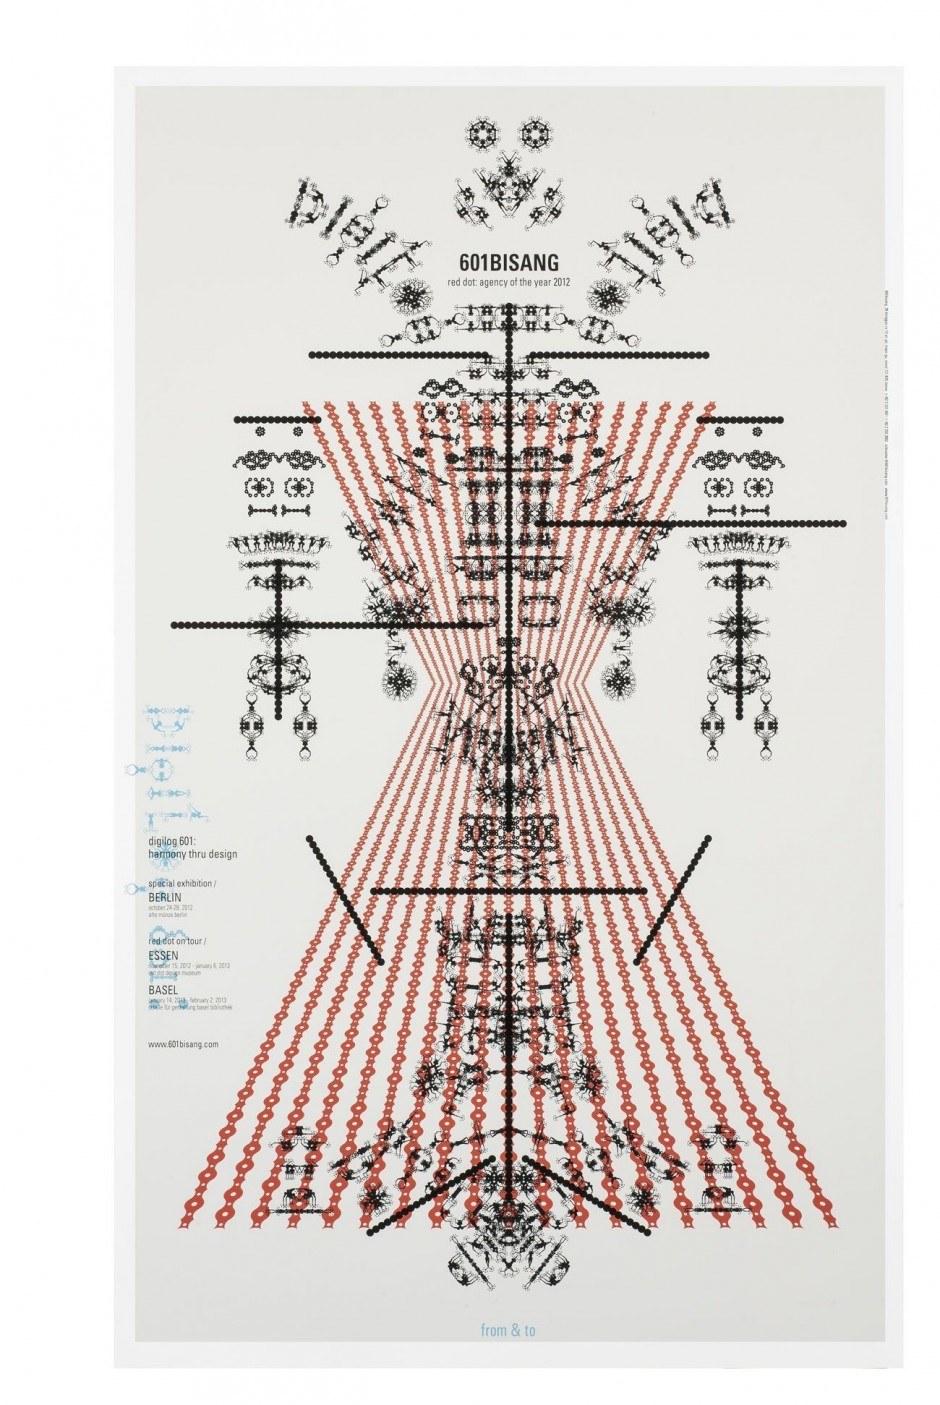 PARK Kum-jun, Harmony through Design – From & to, Poster, 2012